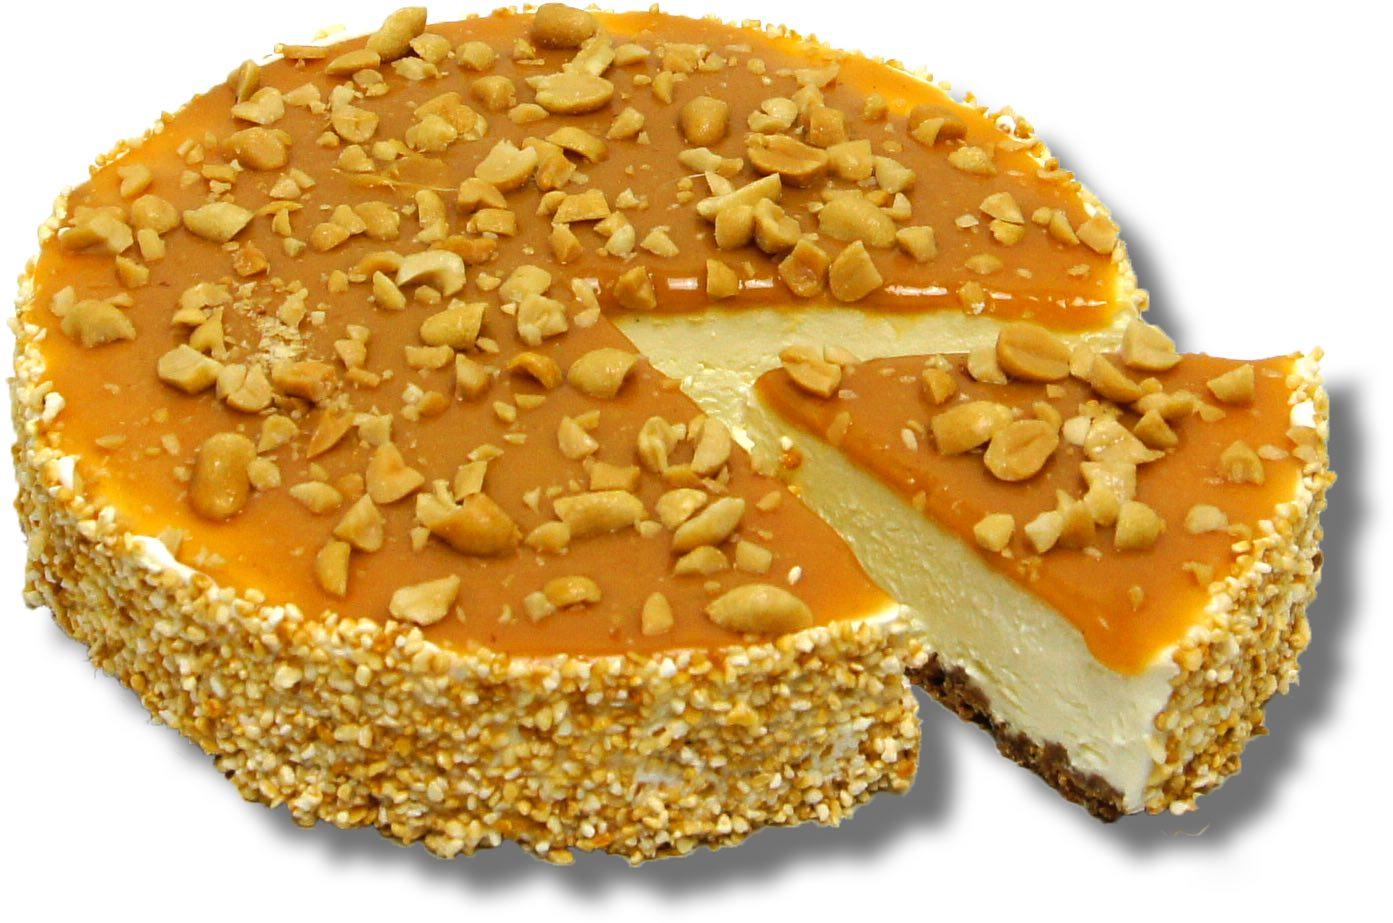 Cheesecake Whisky-Caramel